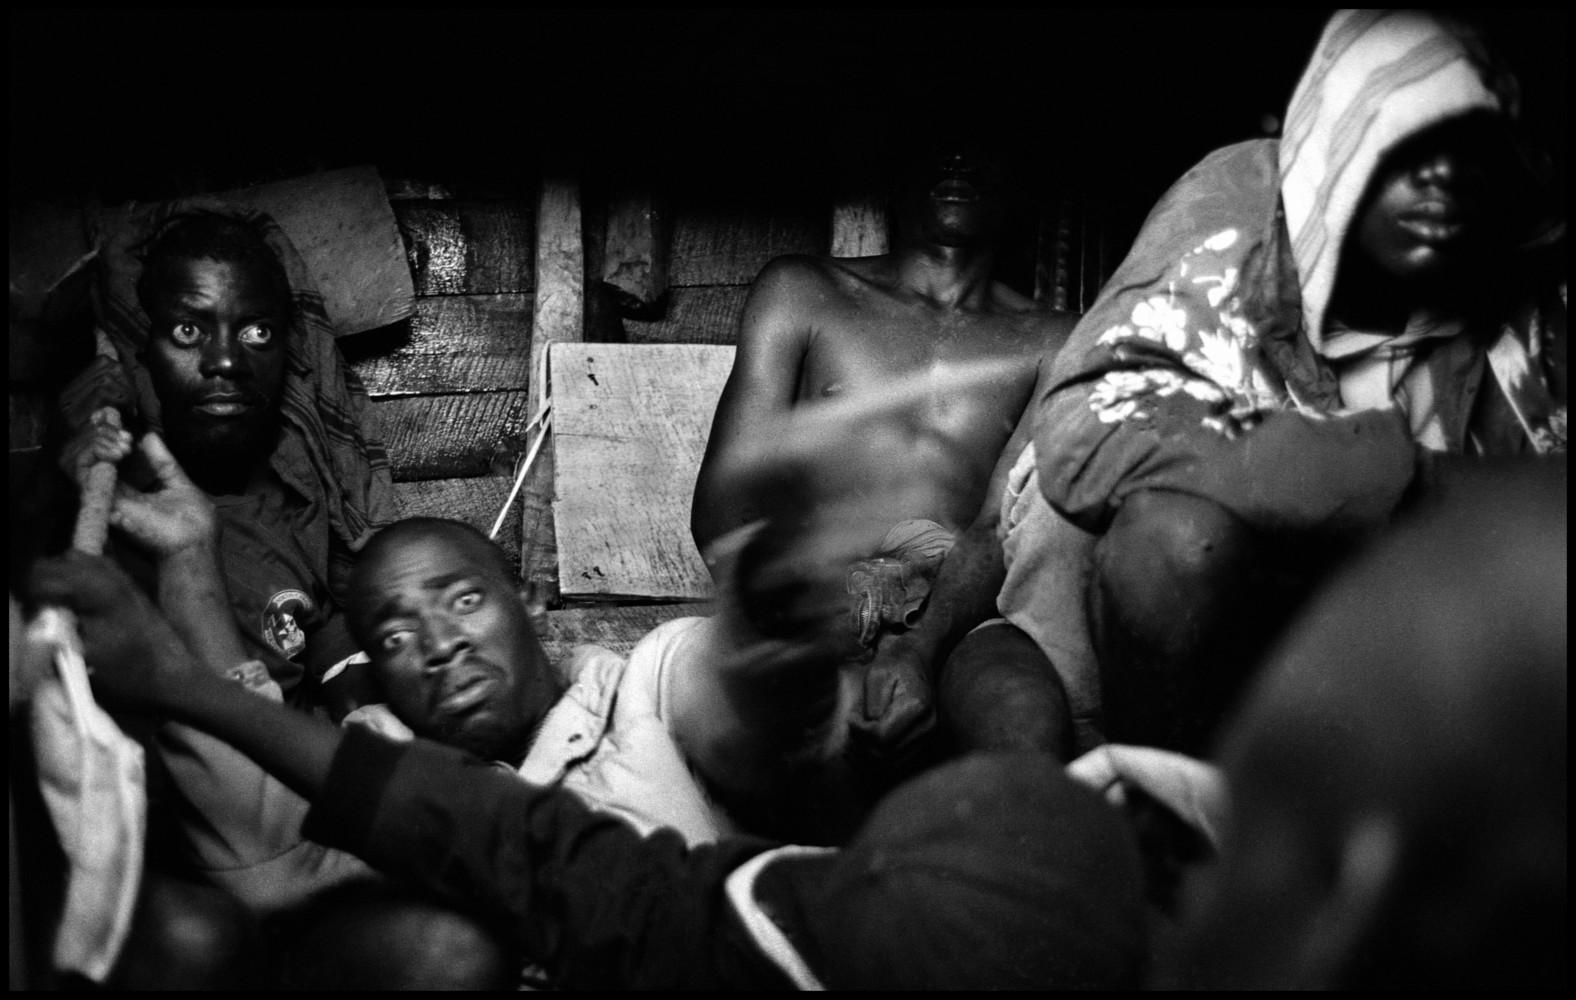 Christopher Anderson: Haiti